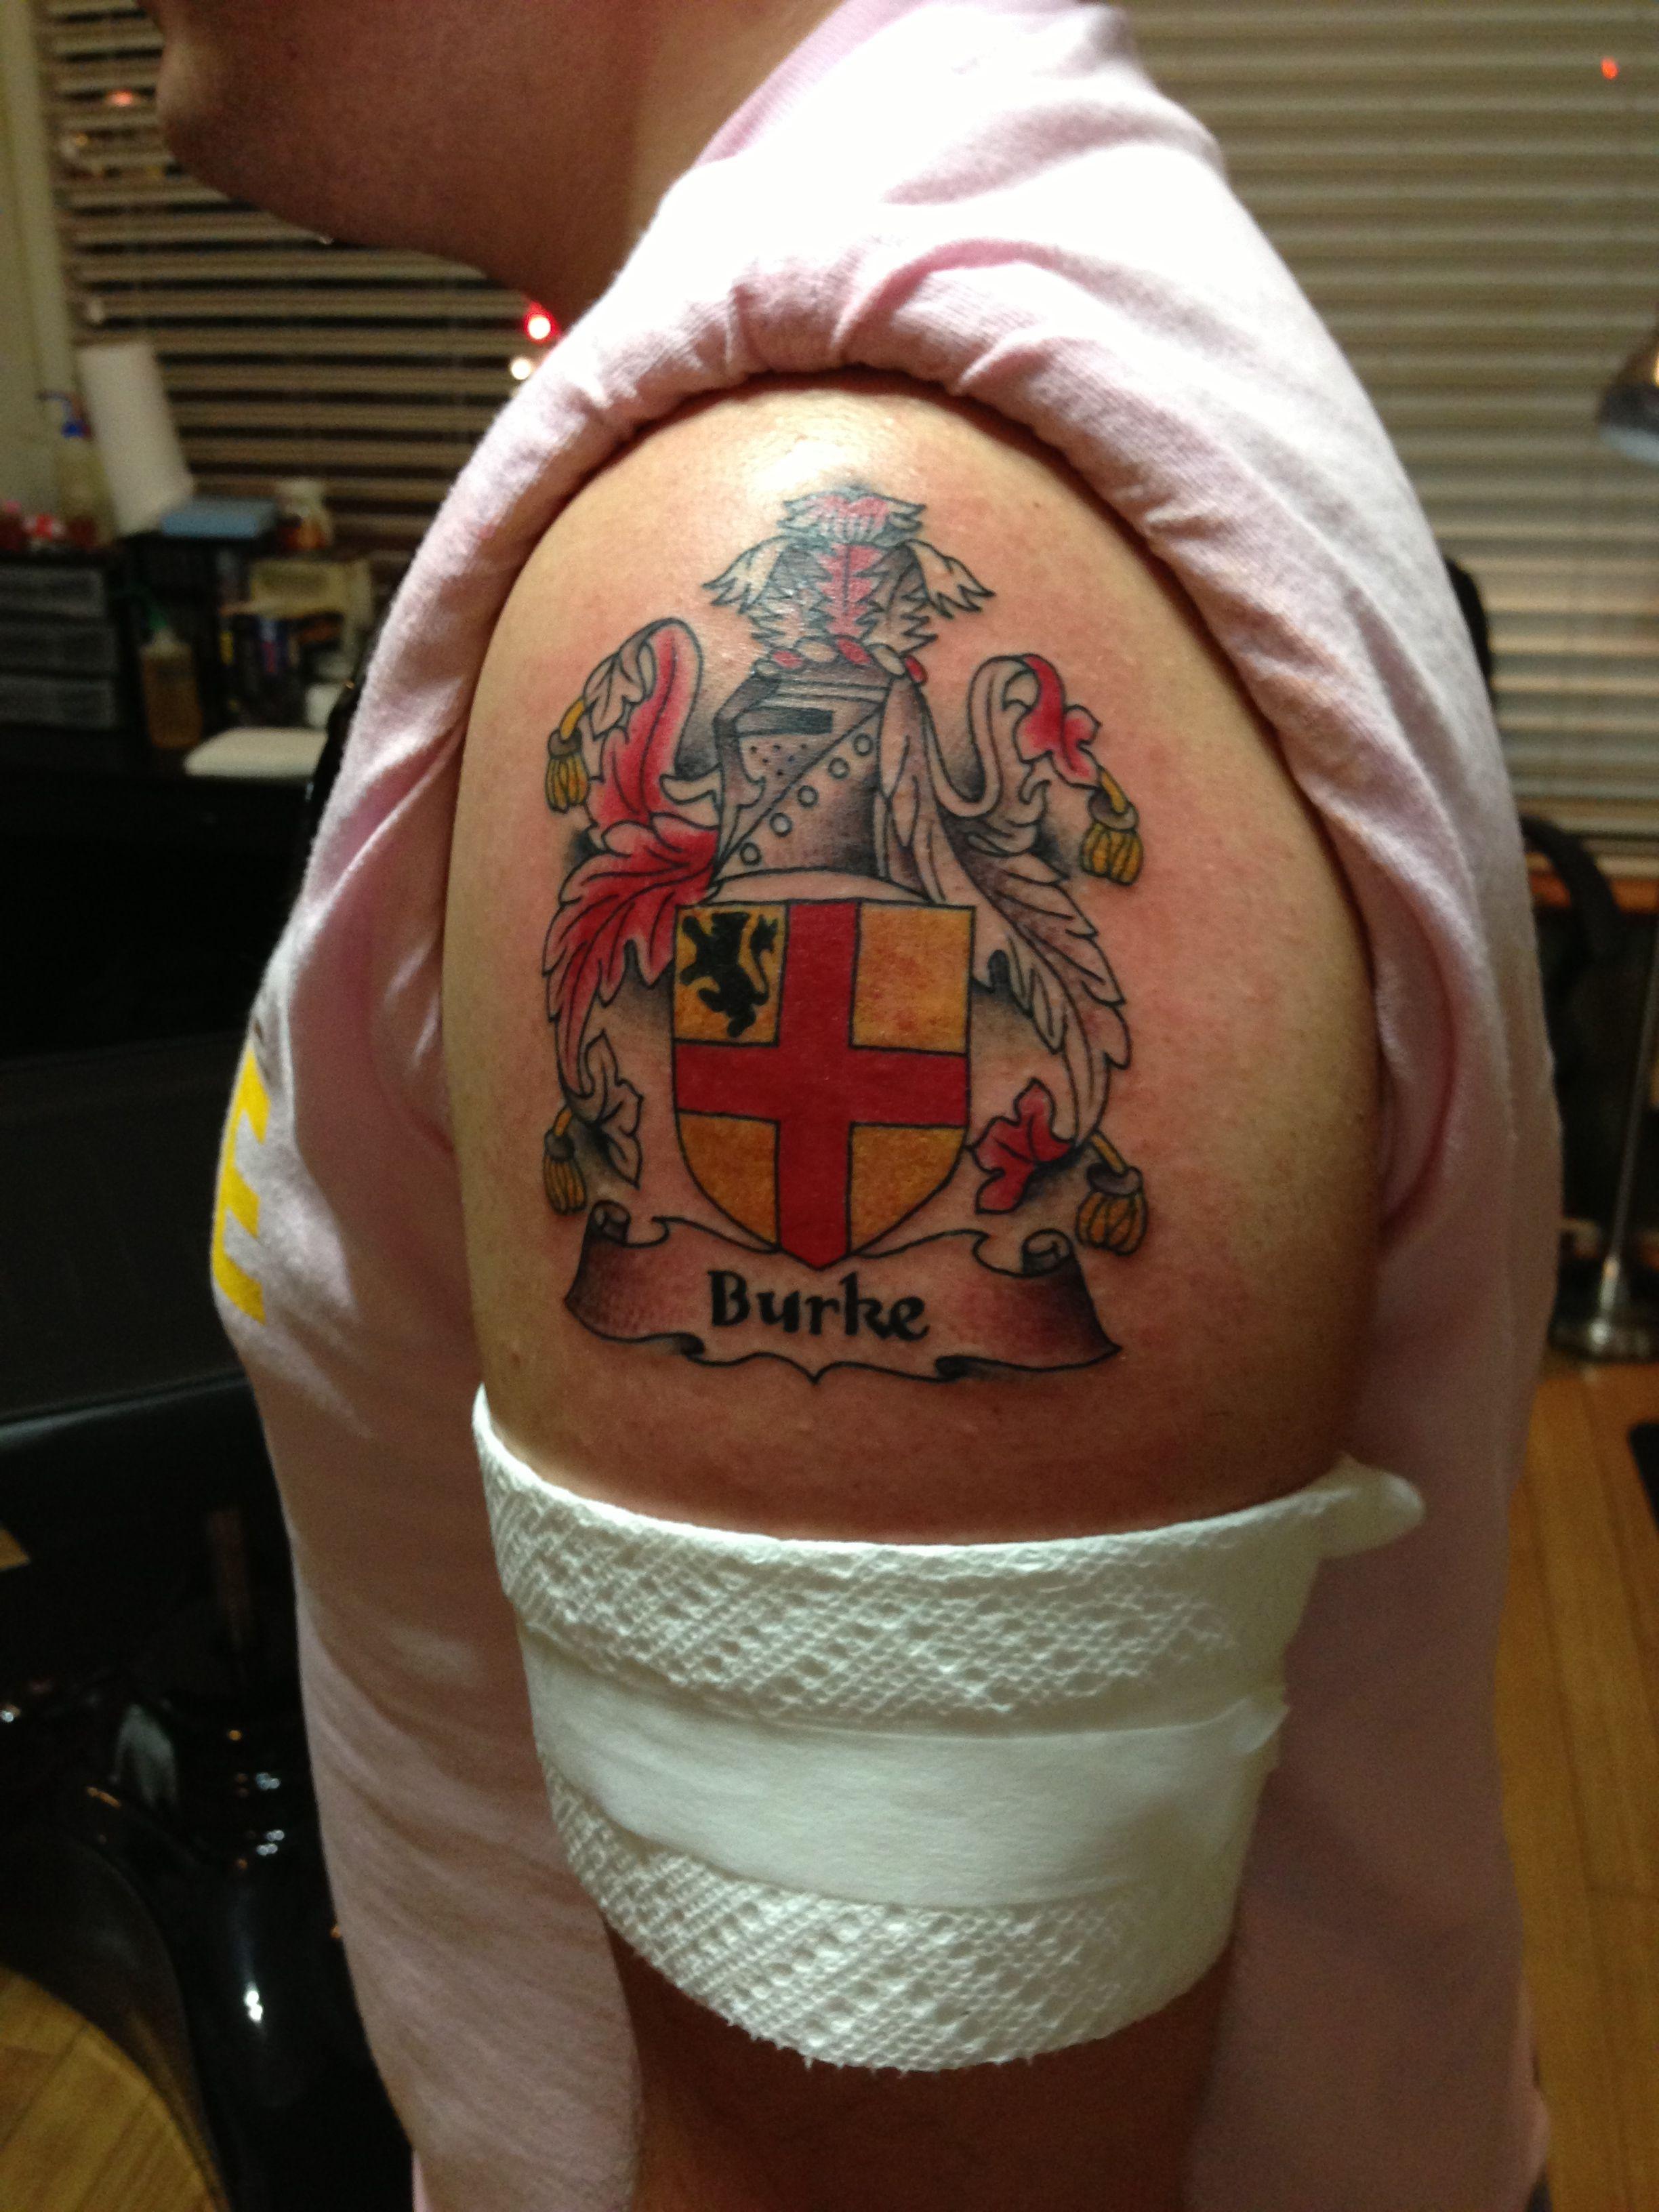 714ccf106 My new #tattoo Coat of Arms #tattoo #tattoos #ink #family #crest  #coatofarms #heraldry #genealogy #shield